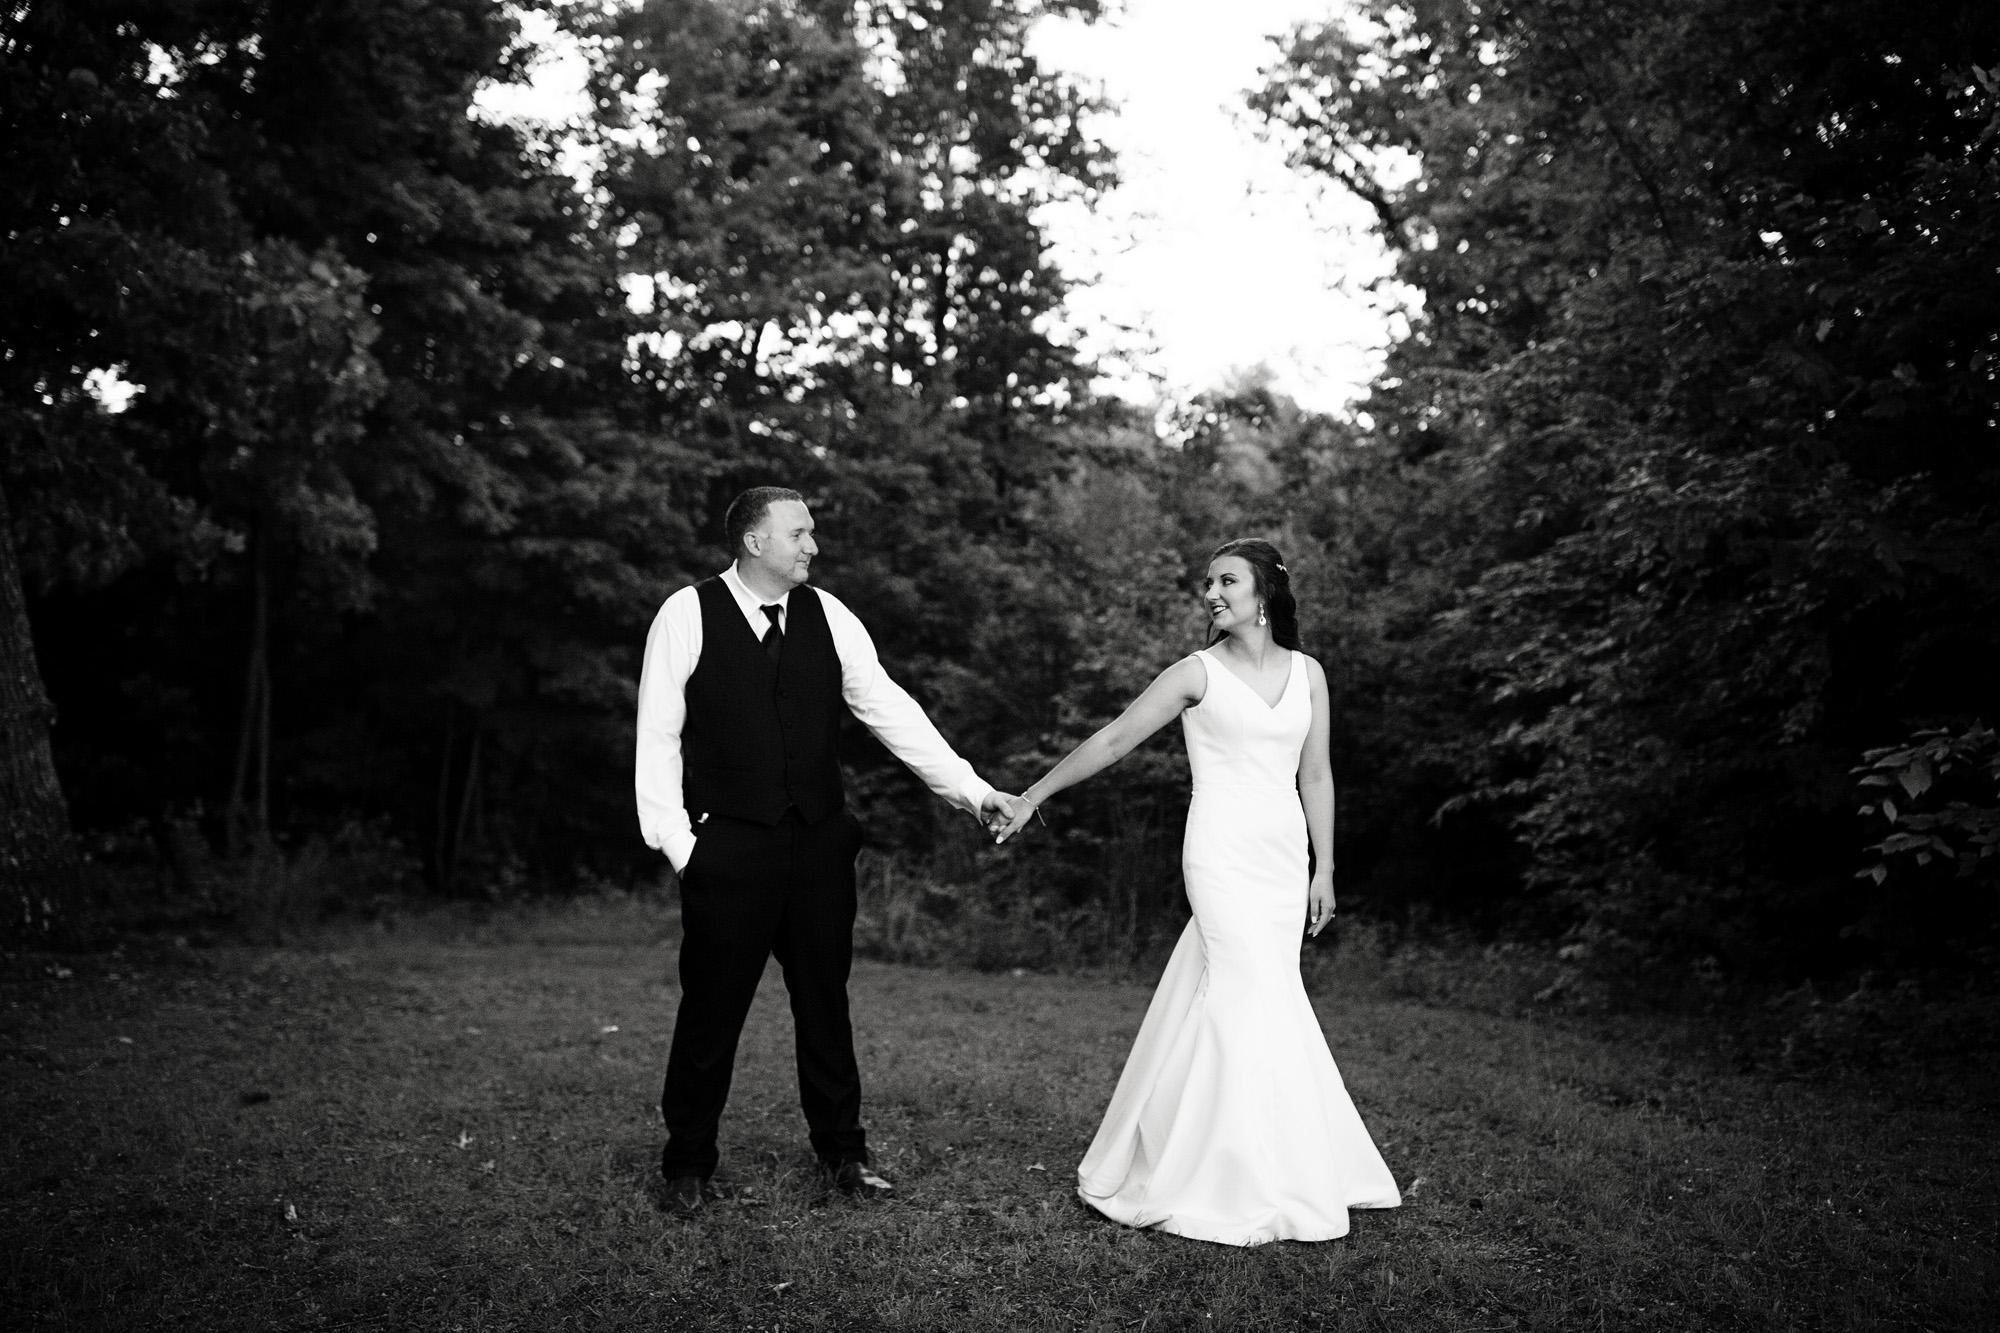 Seriously_Sabrina_Photography_Red_River_Gorge_Wedding_Barn_Robinson126.jpg